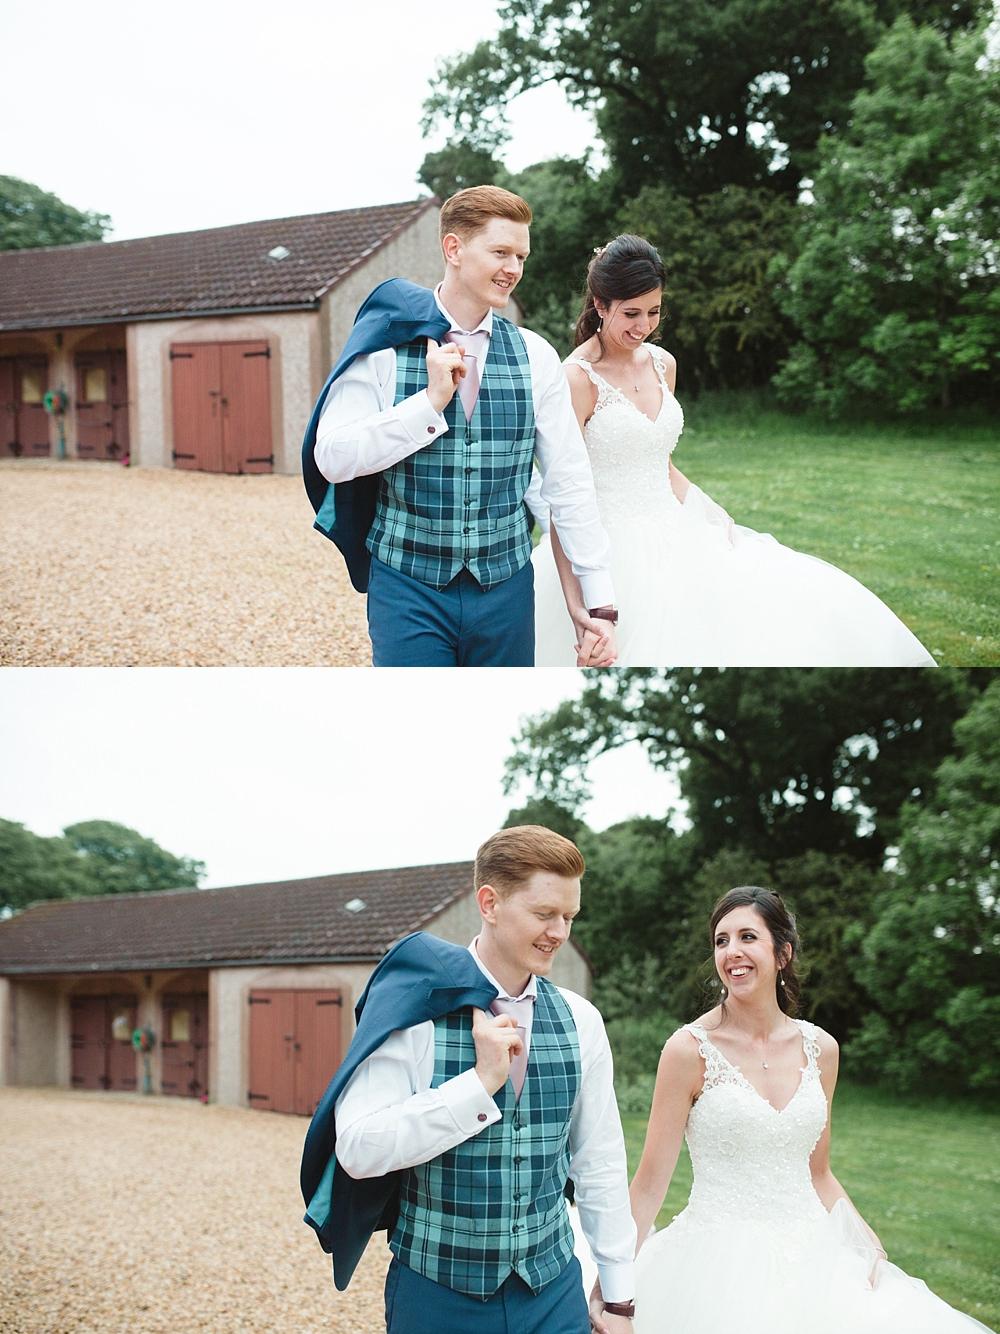 wedding-newton-mearns-glenbervie-57-56